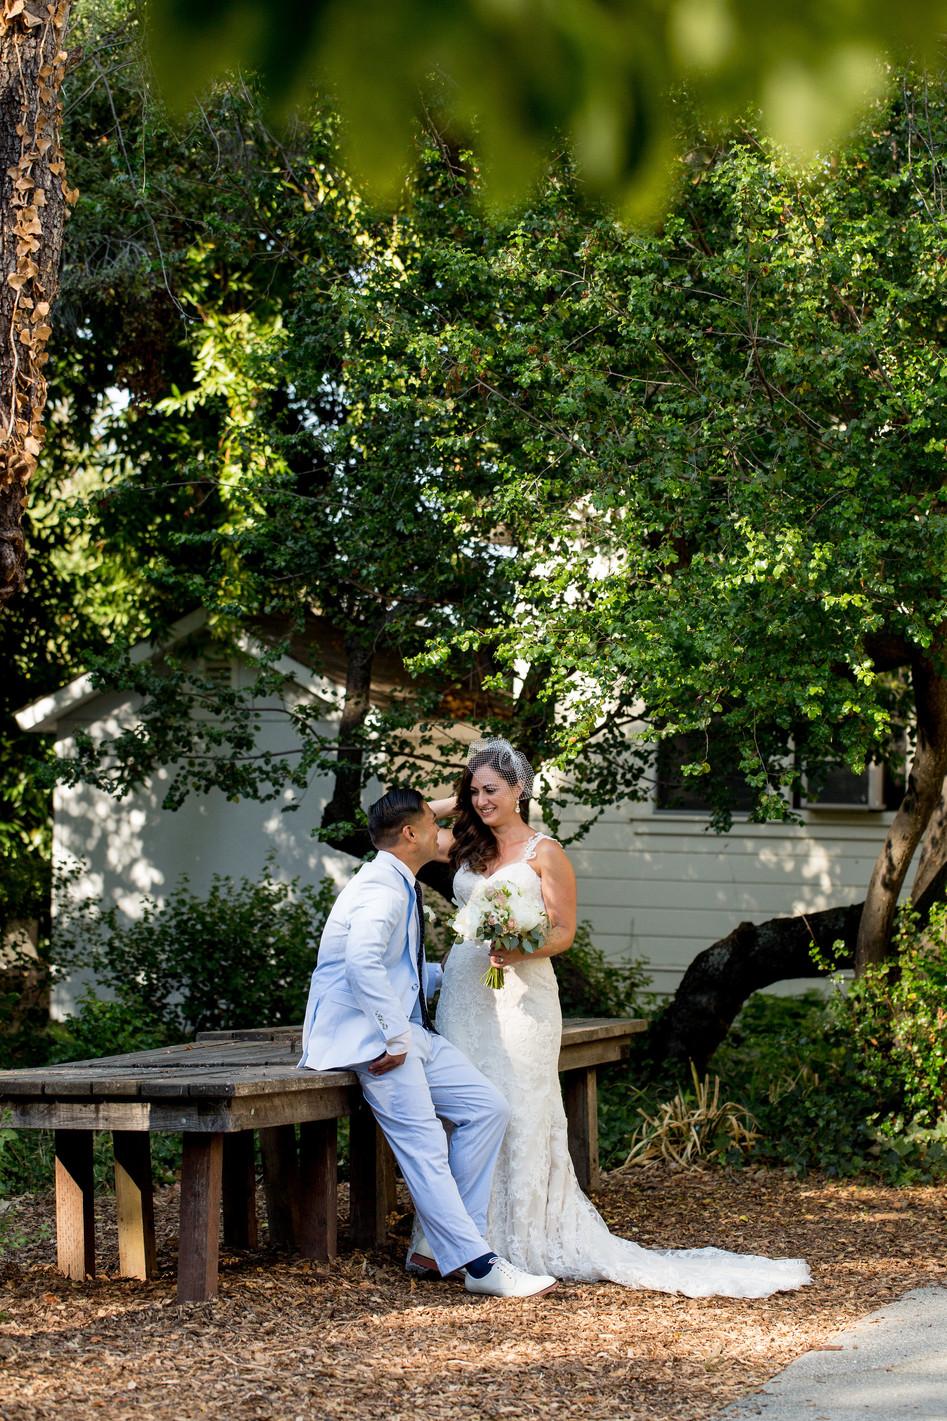 katiephil_wedding_407.jpg